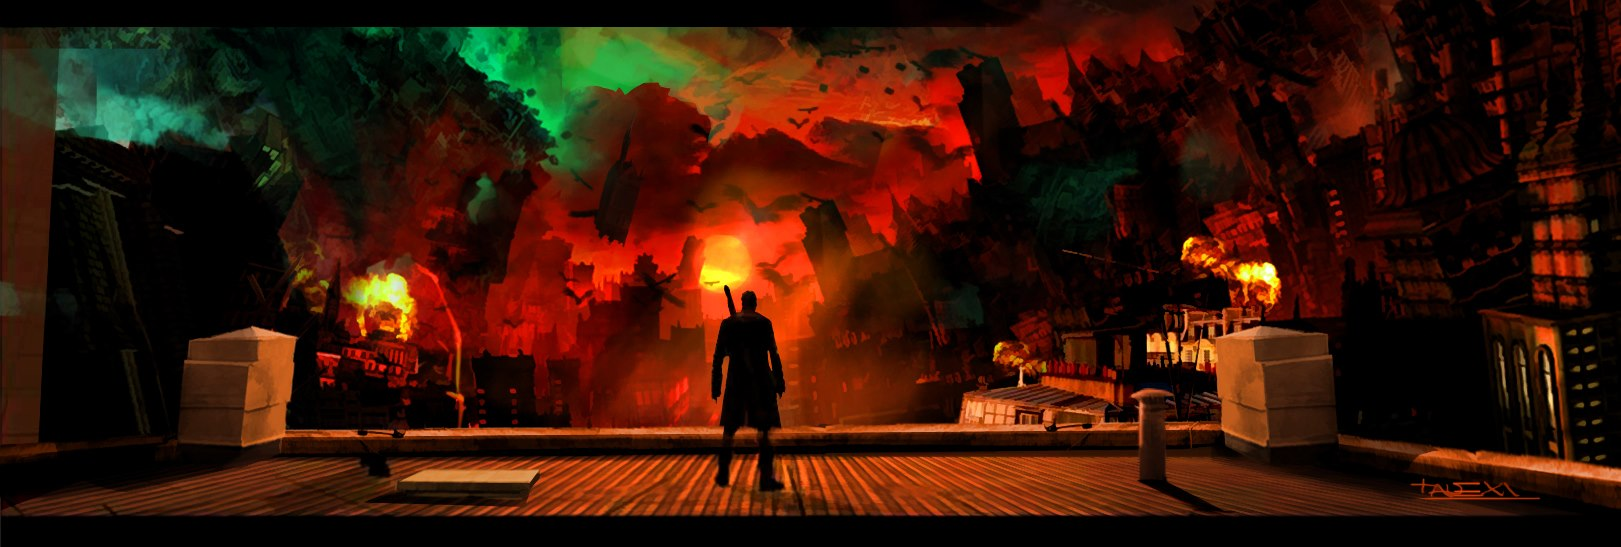 Devil May Cry Artworks 7 تصاویرهنری جدید Devil May Cry نشان از ذوق هنری در بازی میدهد